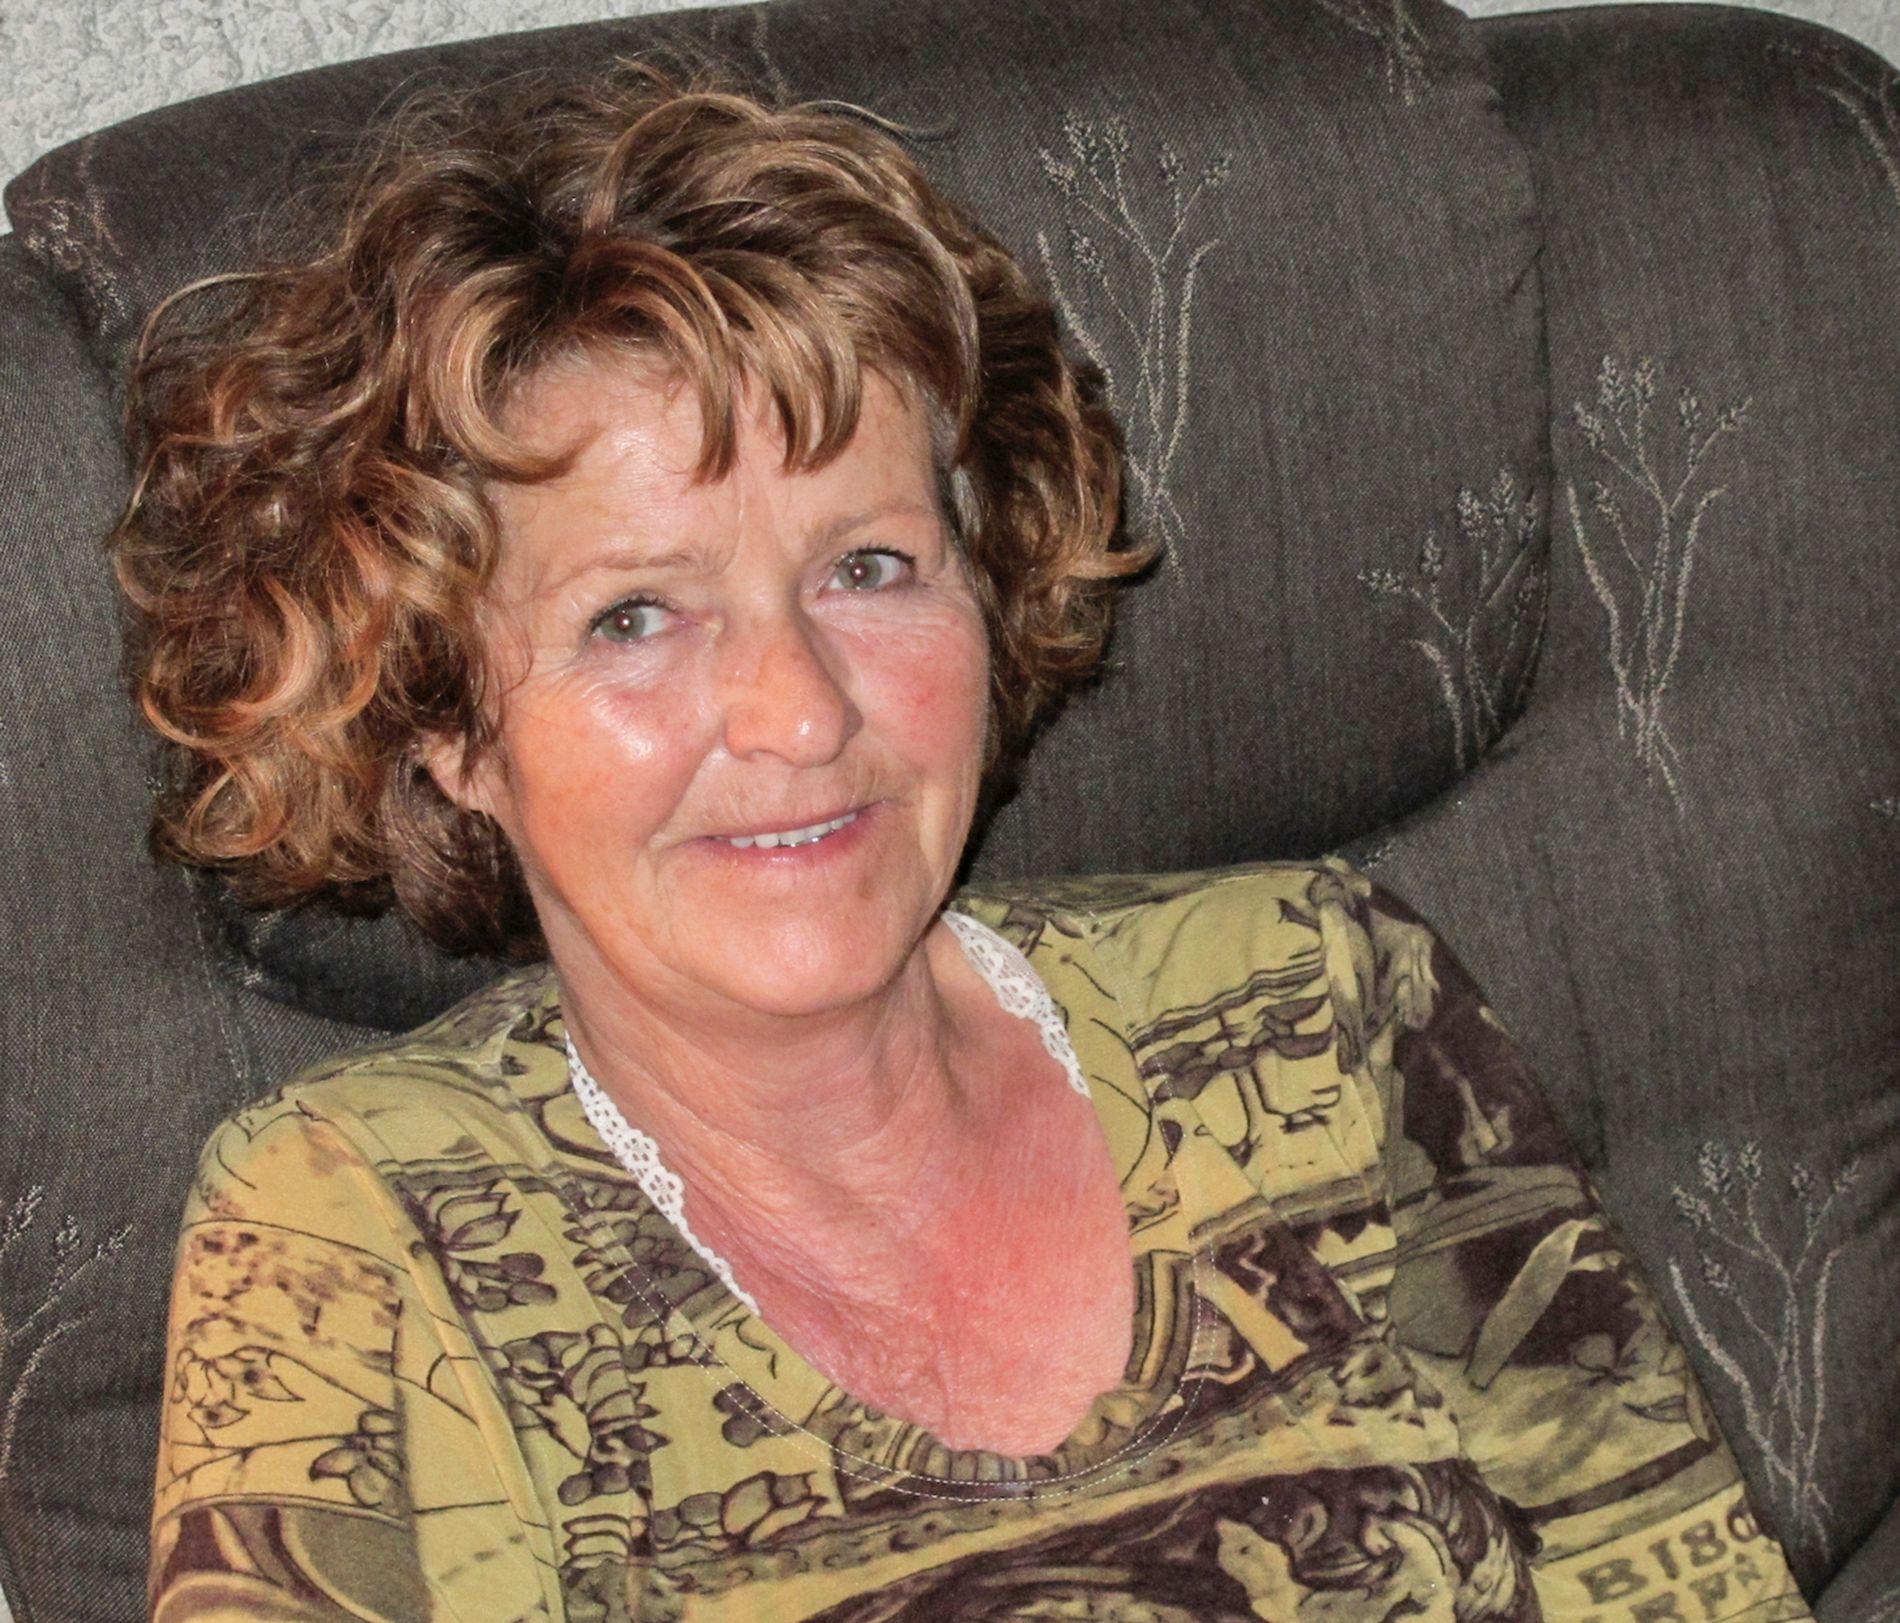 Anne-Elisabeth Hagen (68) har vært savnet fra sitt hjem i Lørenskog siden onsdag 31. oktober i fjor.